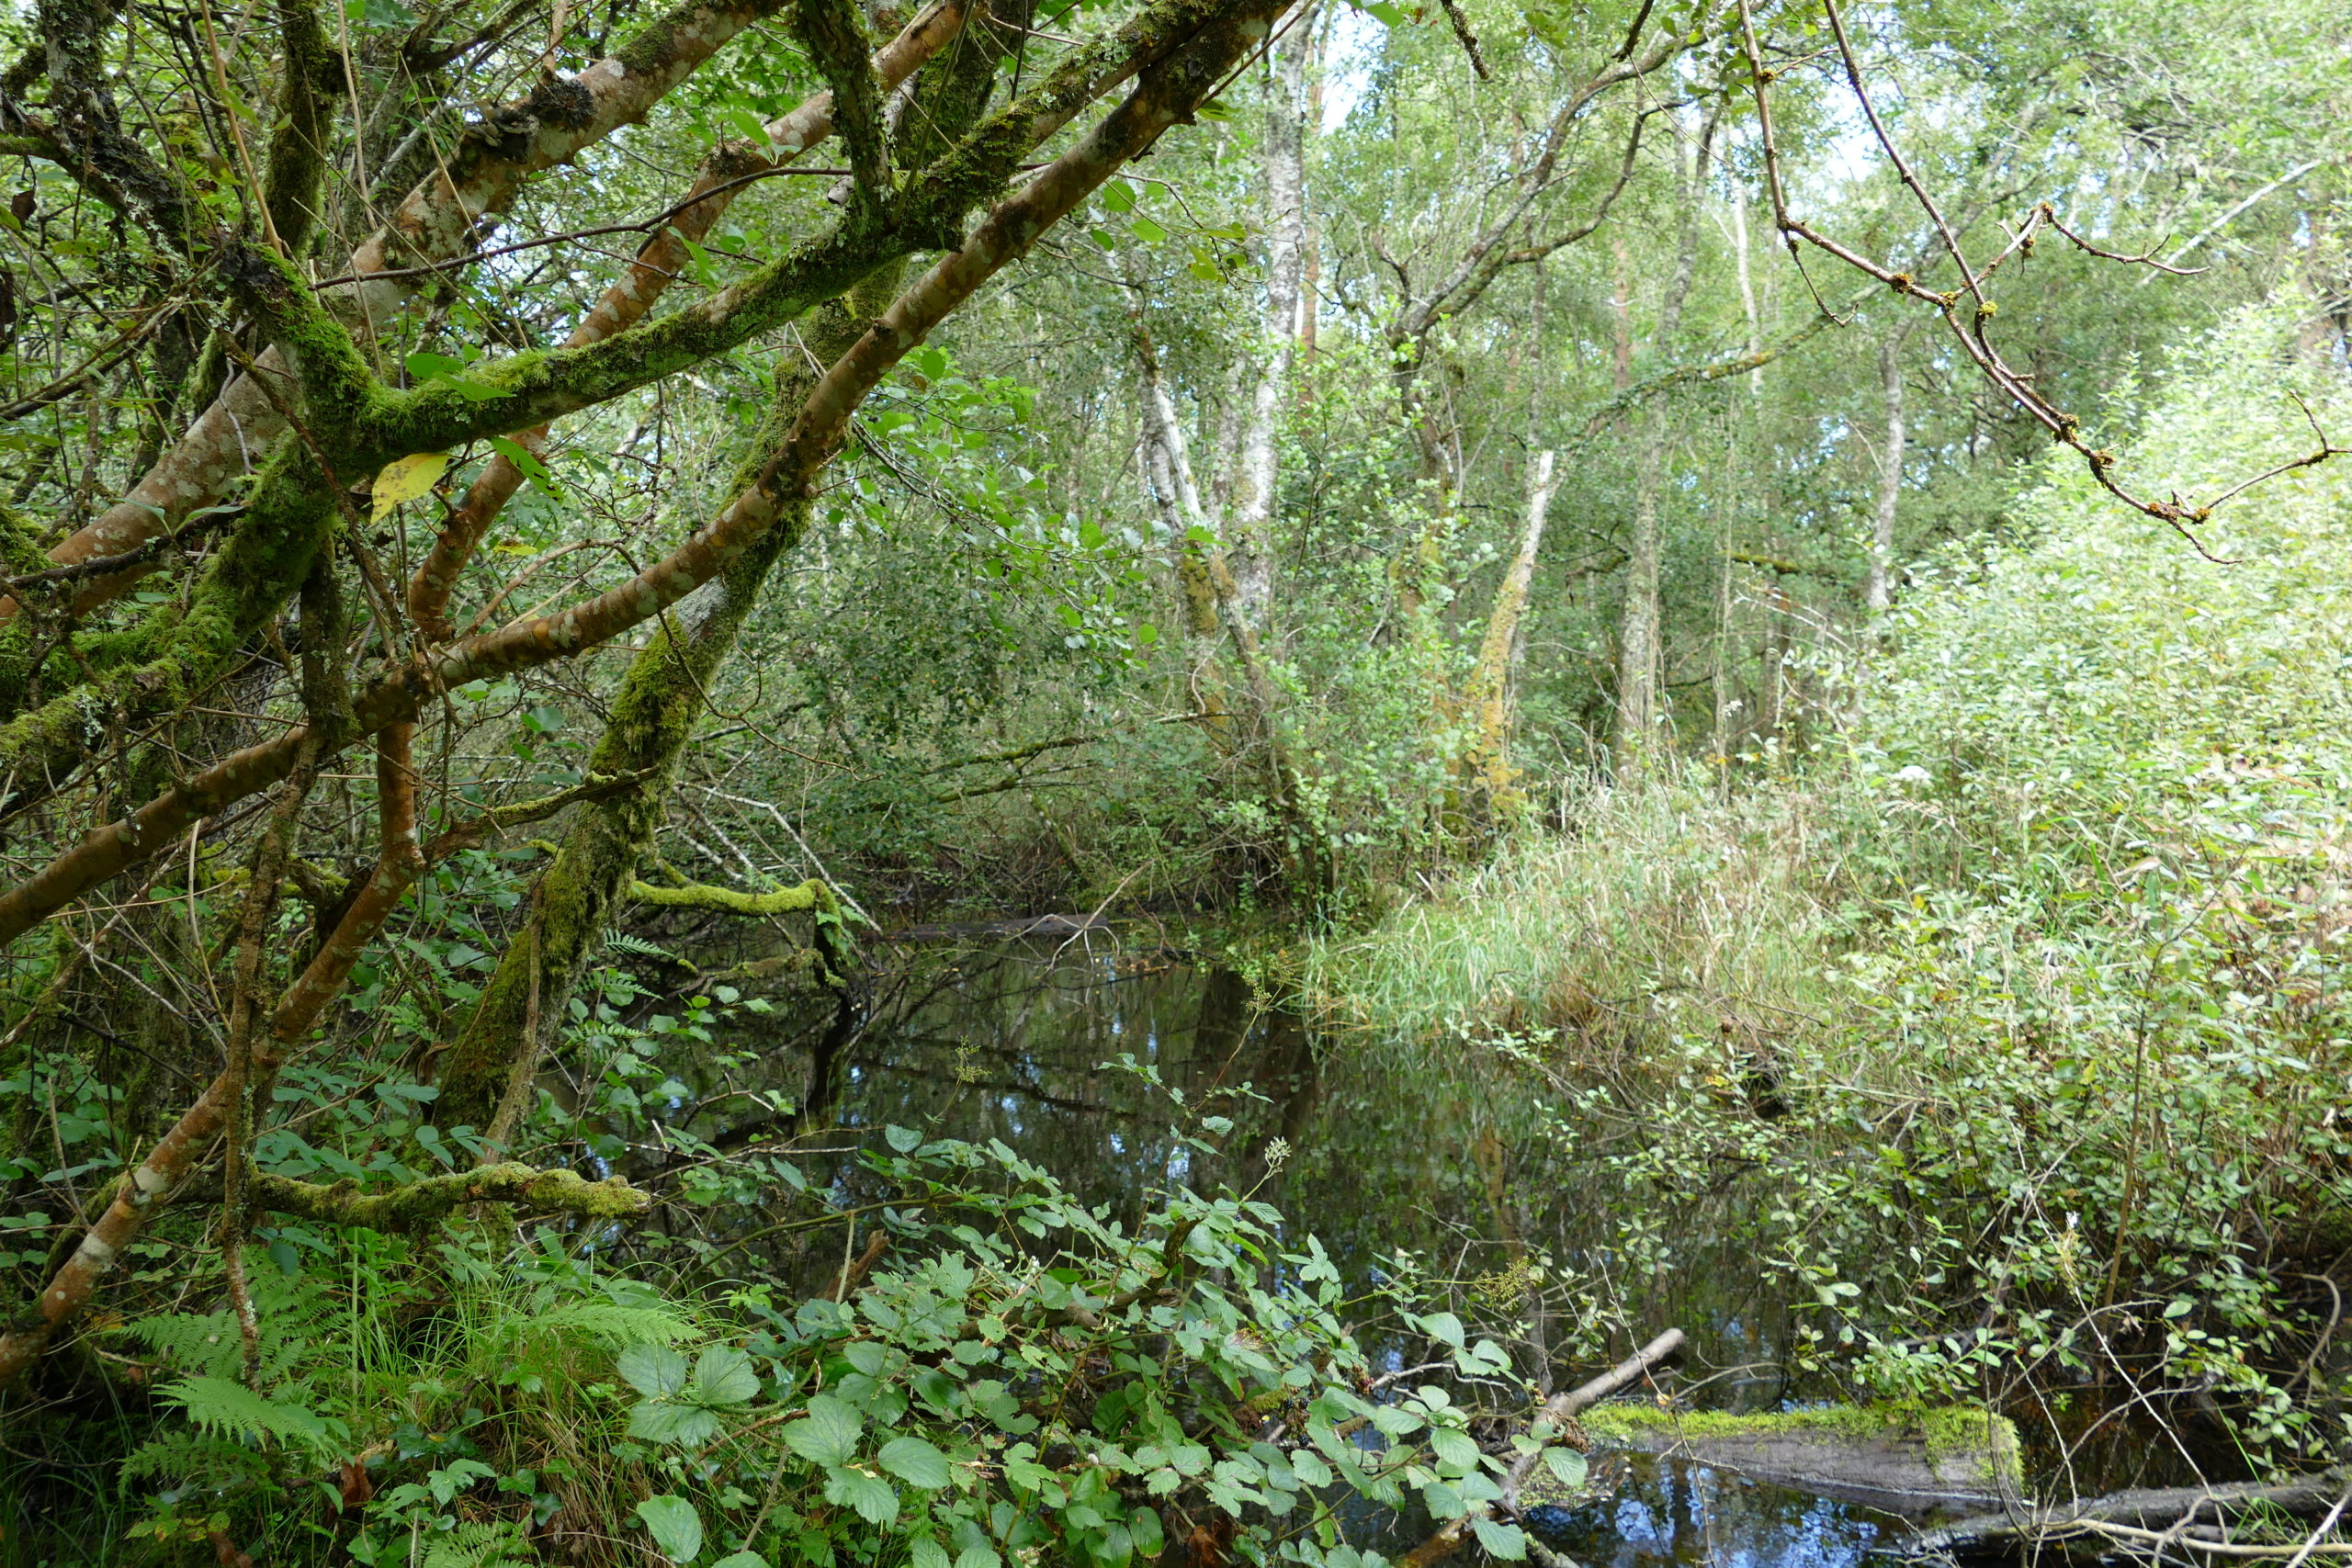 Wet alluvial woodland